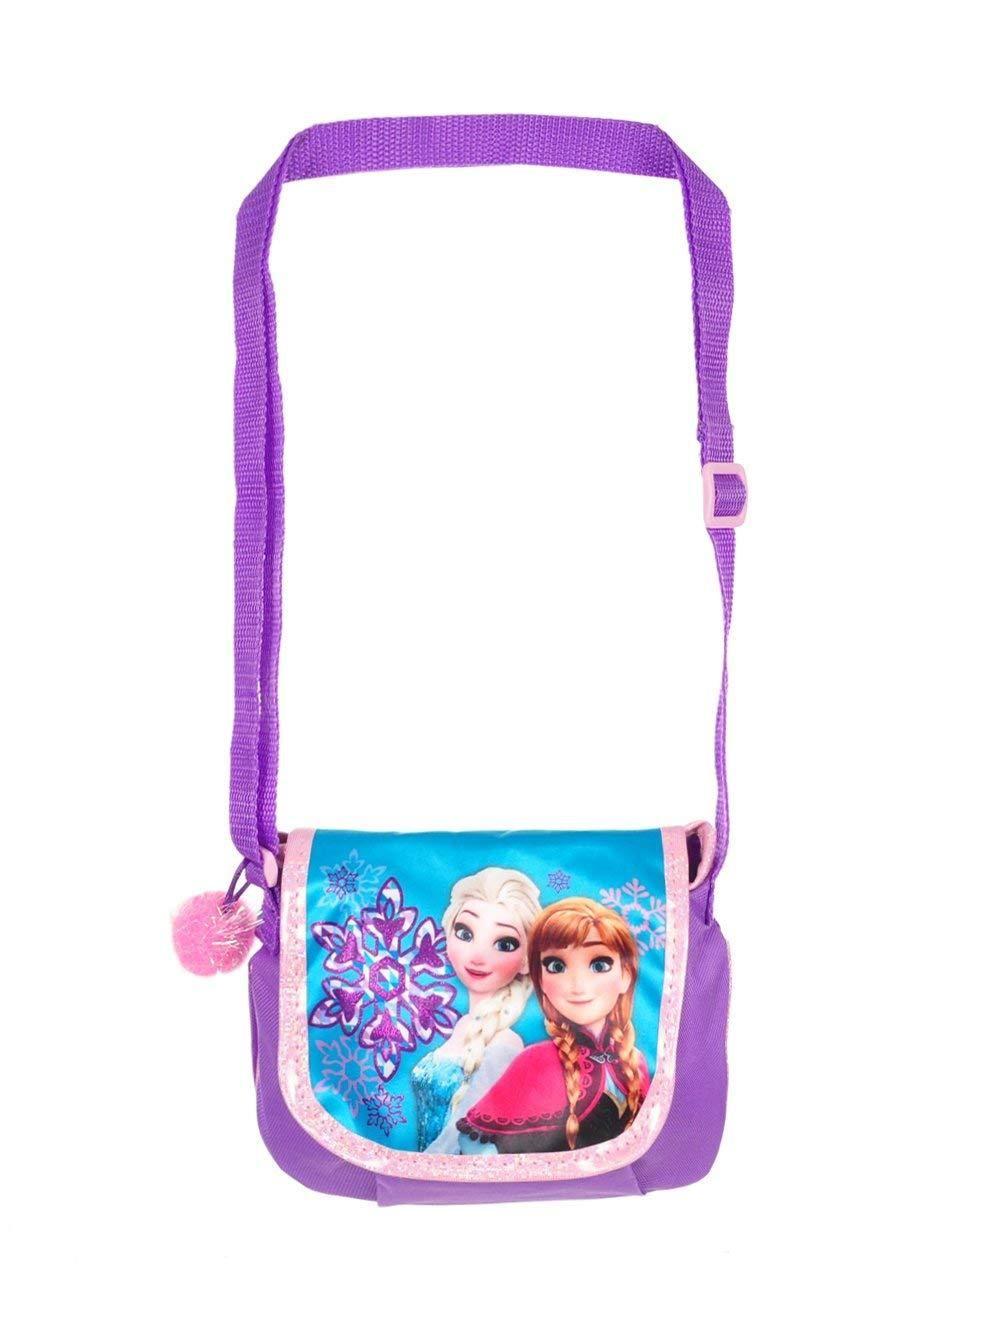 3387f5080d3 Disney Frozen Crossbody Plush Messenger Bag Book Backpack